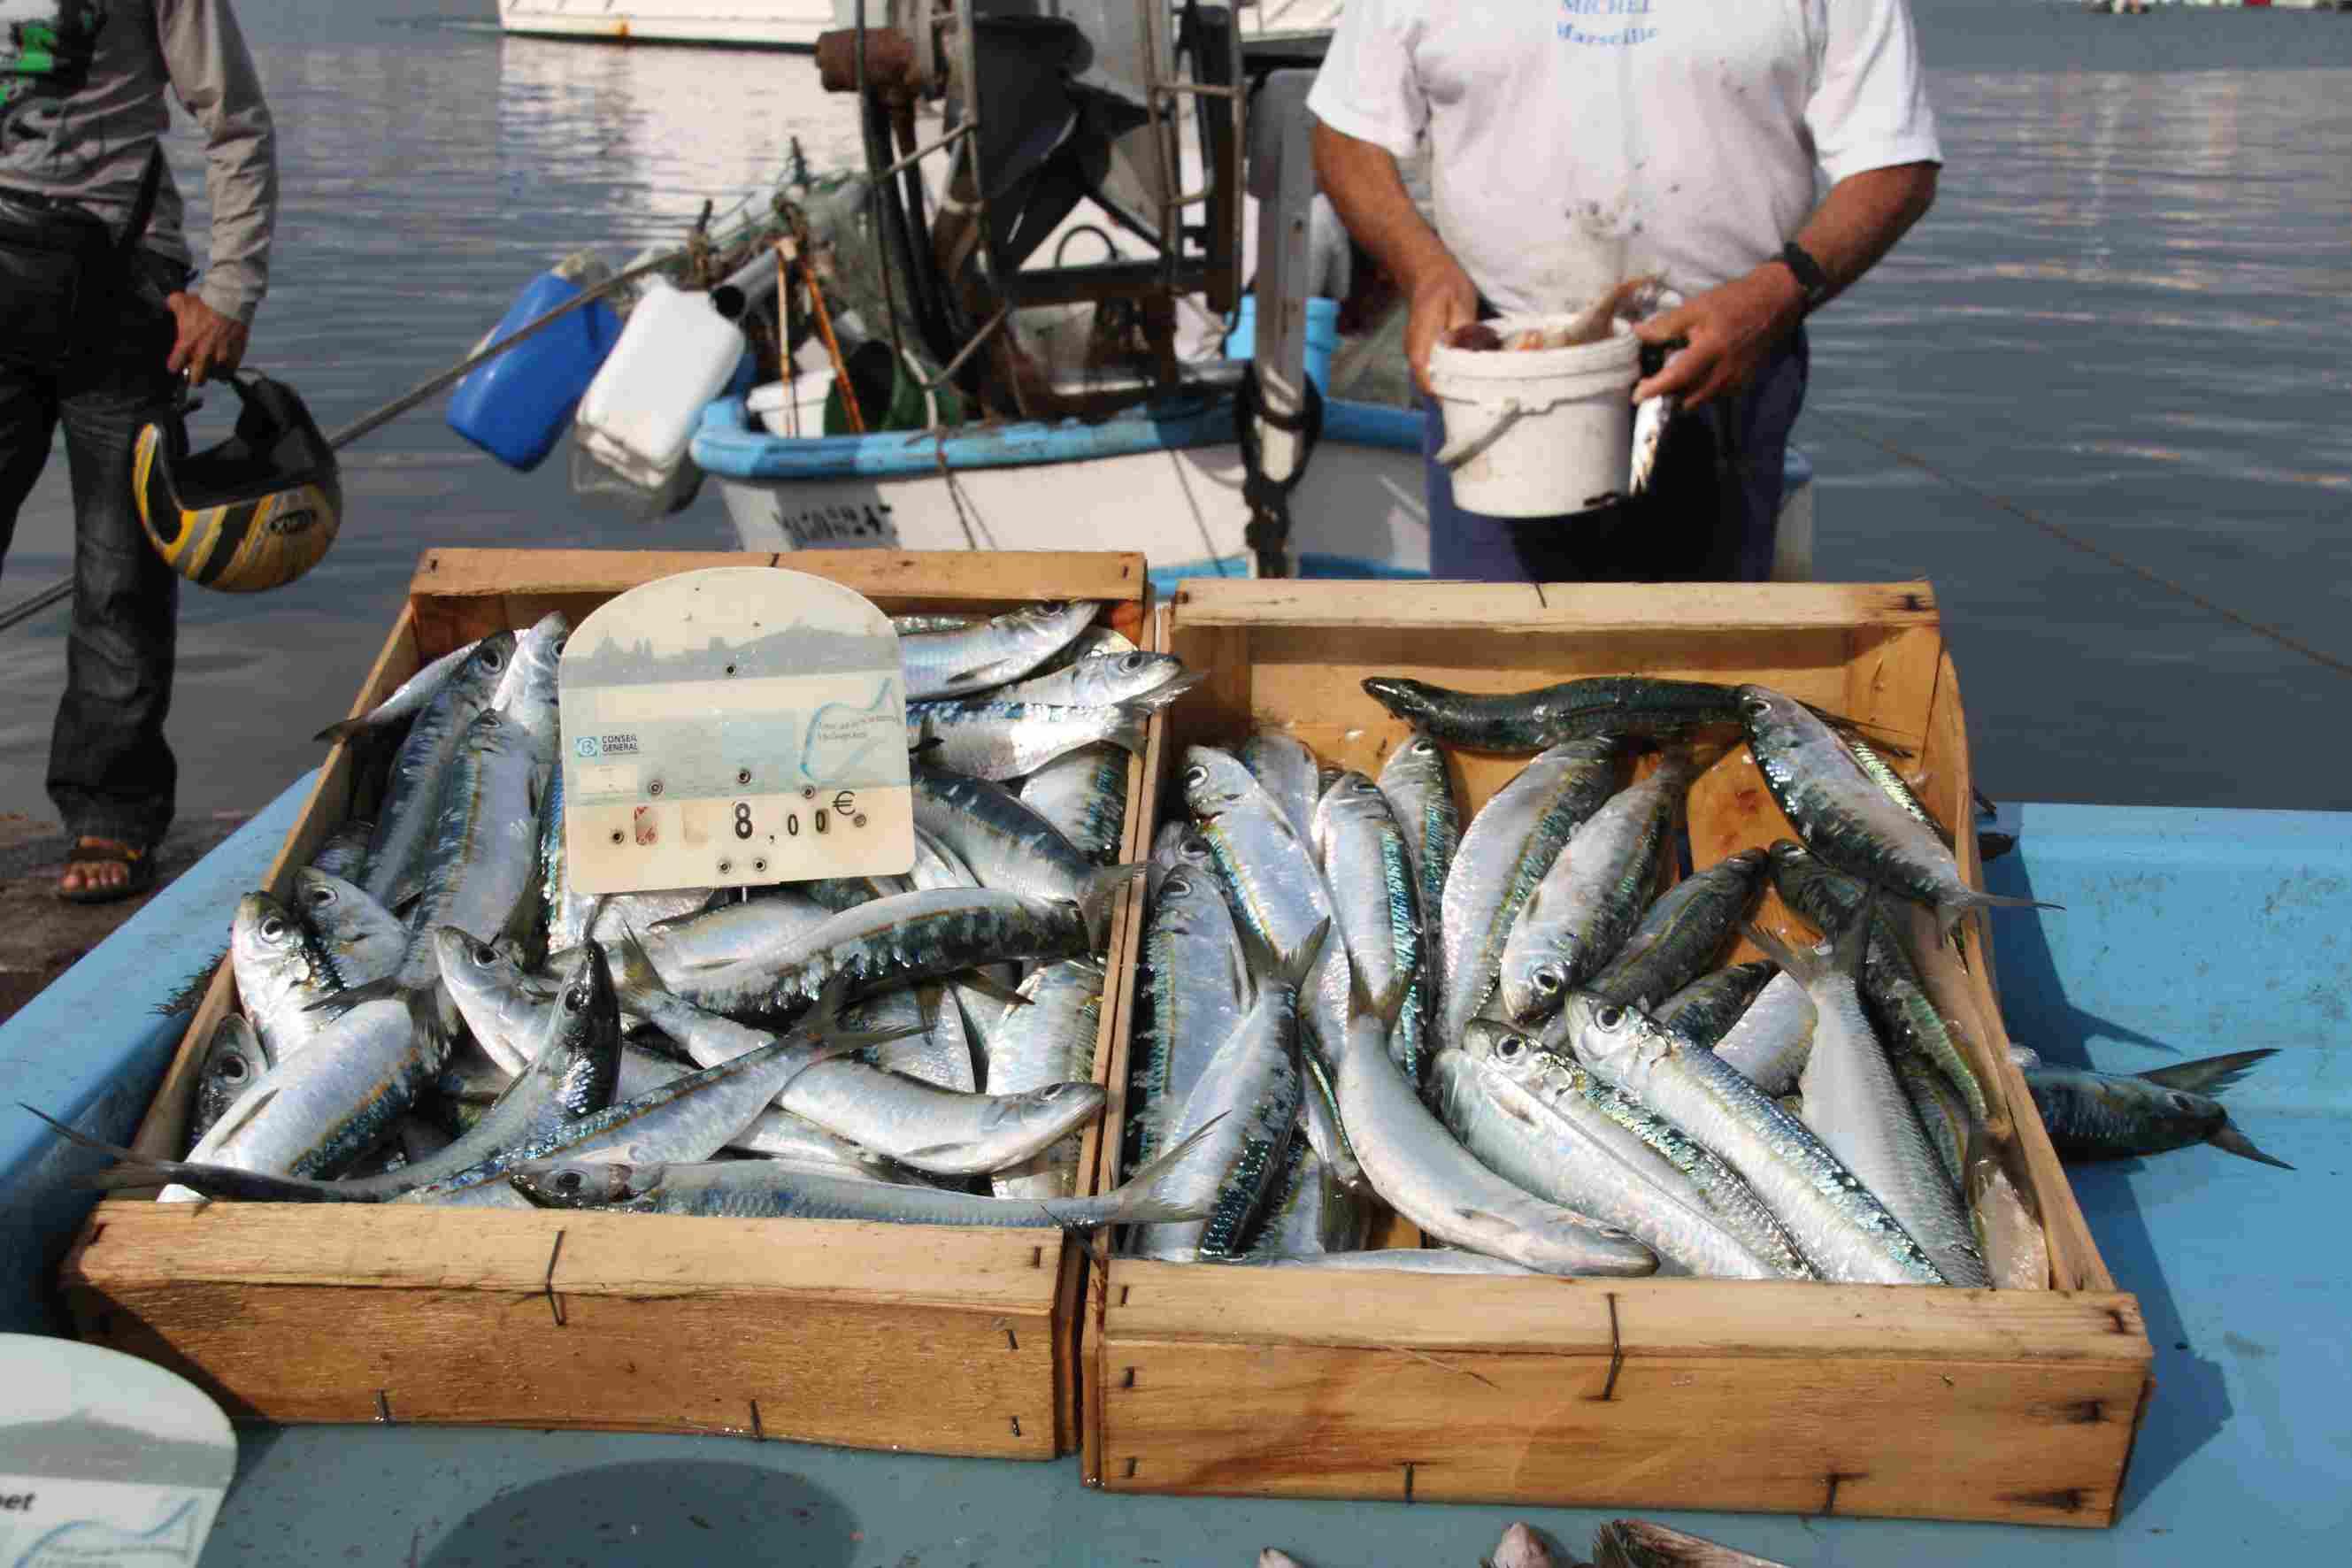 The daily fish market